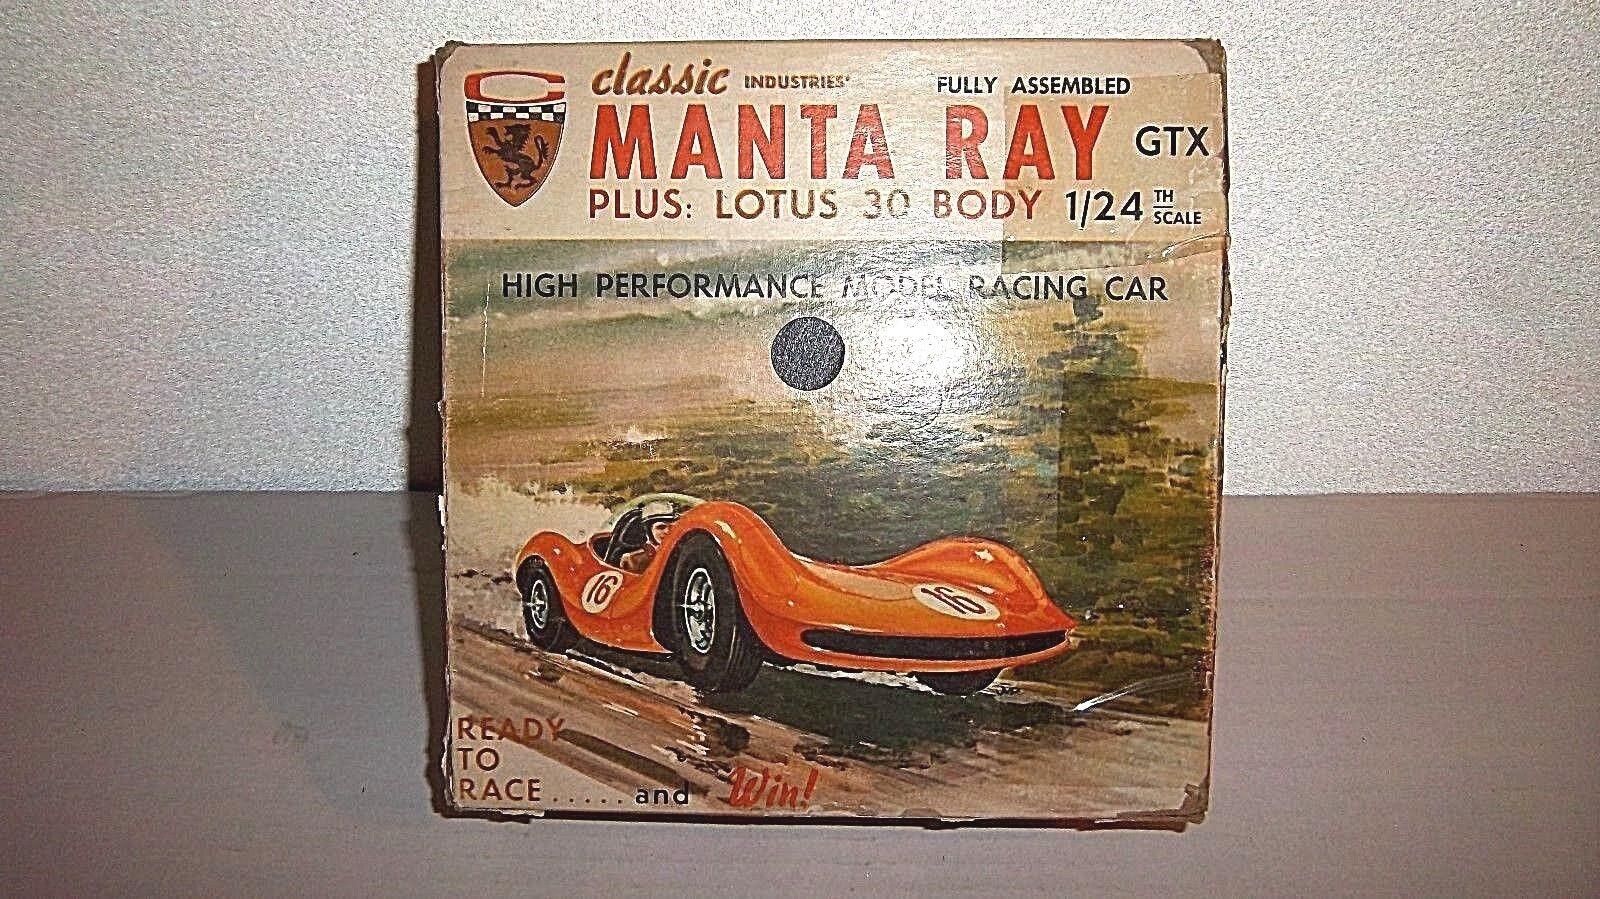 Vintage mantarochen gtx   lotus 30 (2 stellen), high - performance - slot car kit